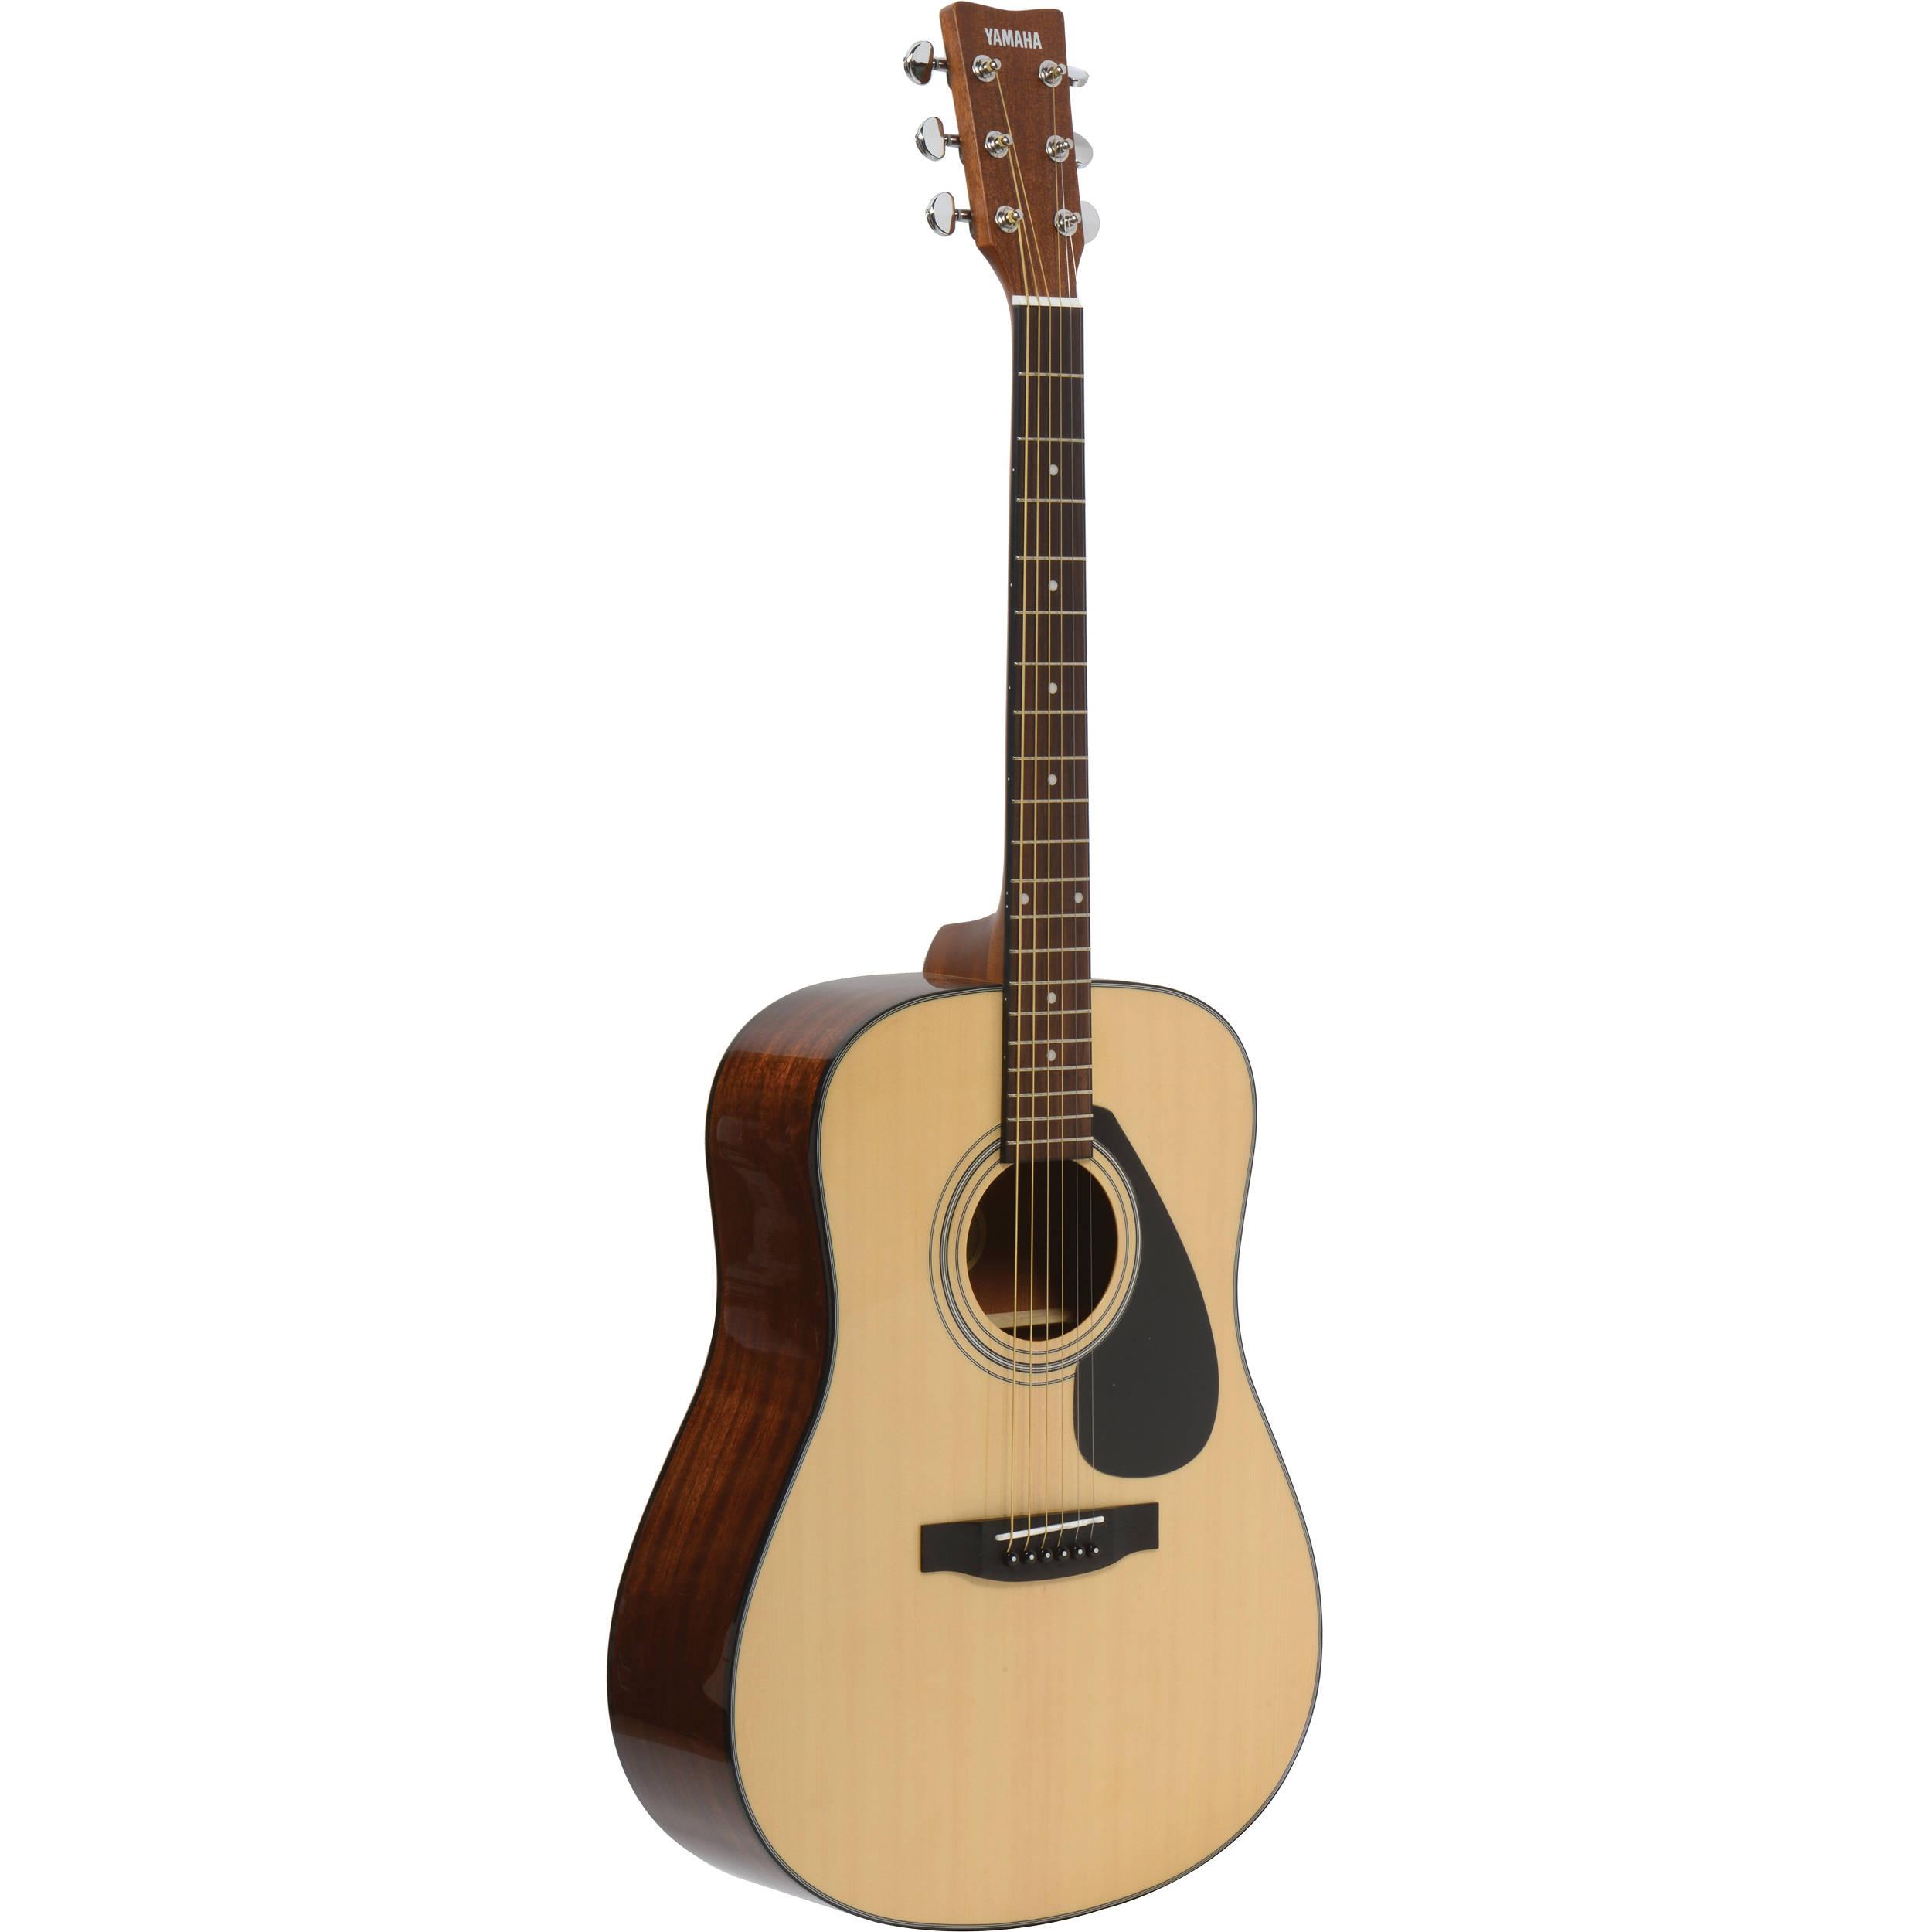 Yamaha gigmaker standard acoustic bundle f325 gigmaker for Yamaha f 325 guitar